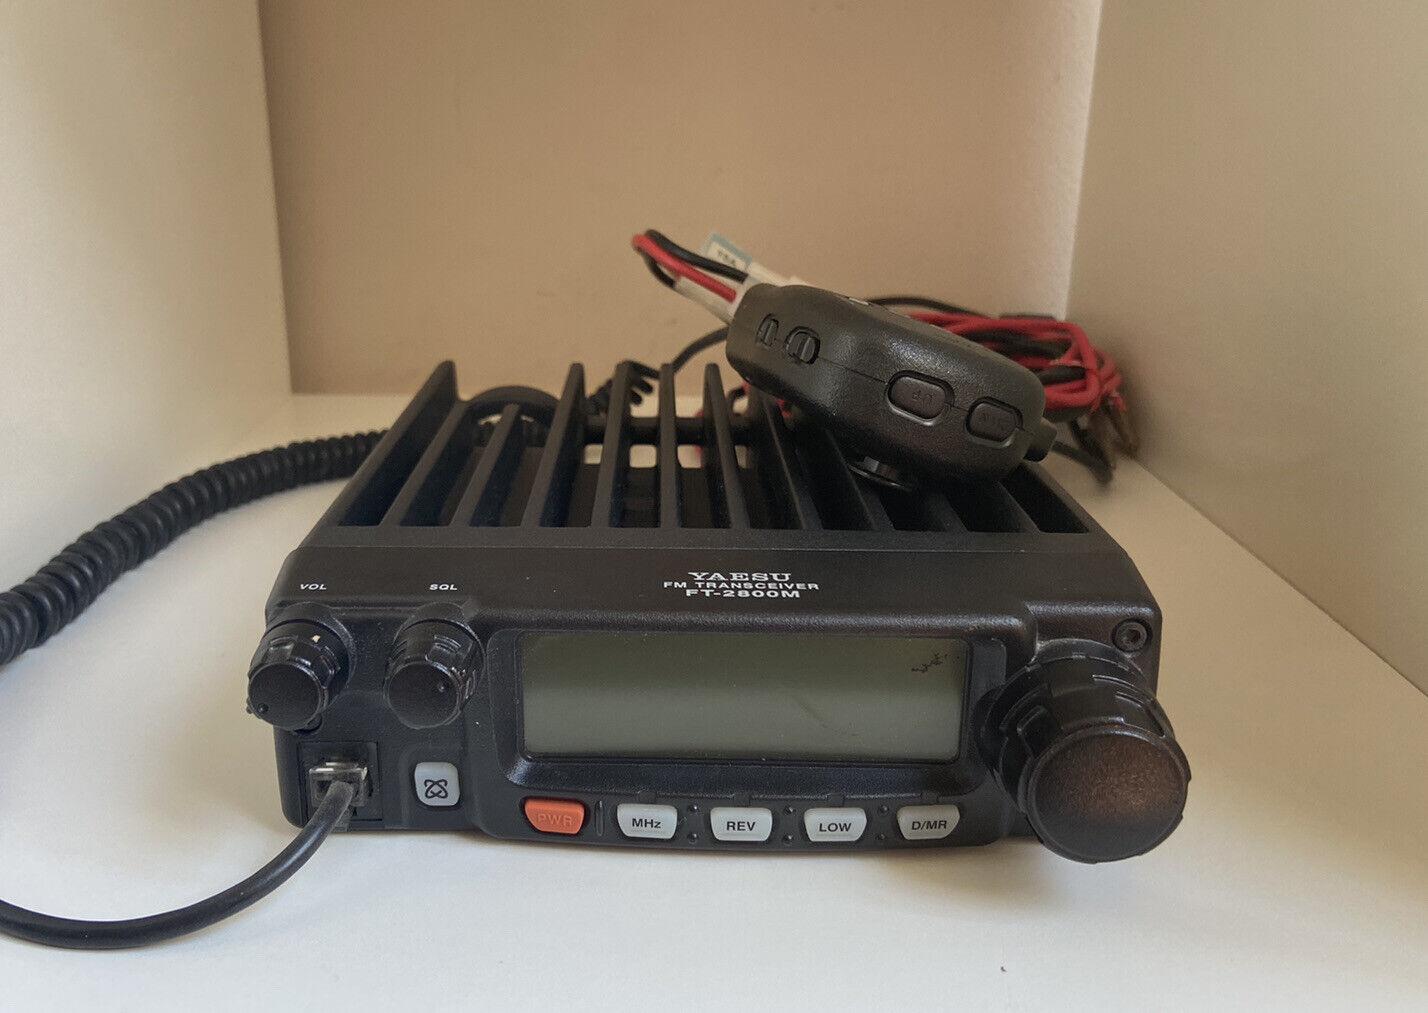 Yaesu FT-2800M Transceiver & Microphone Original Box, Speaker & 2 Antennas. Available Now for 179.99